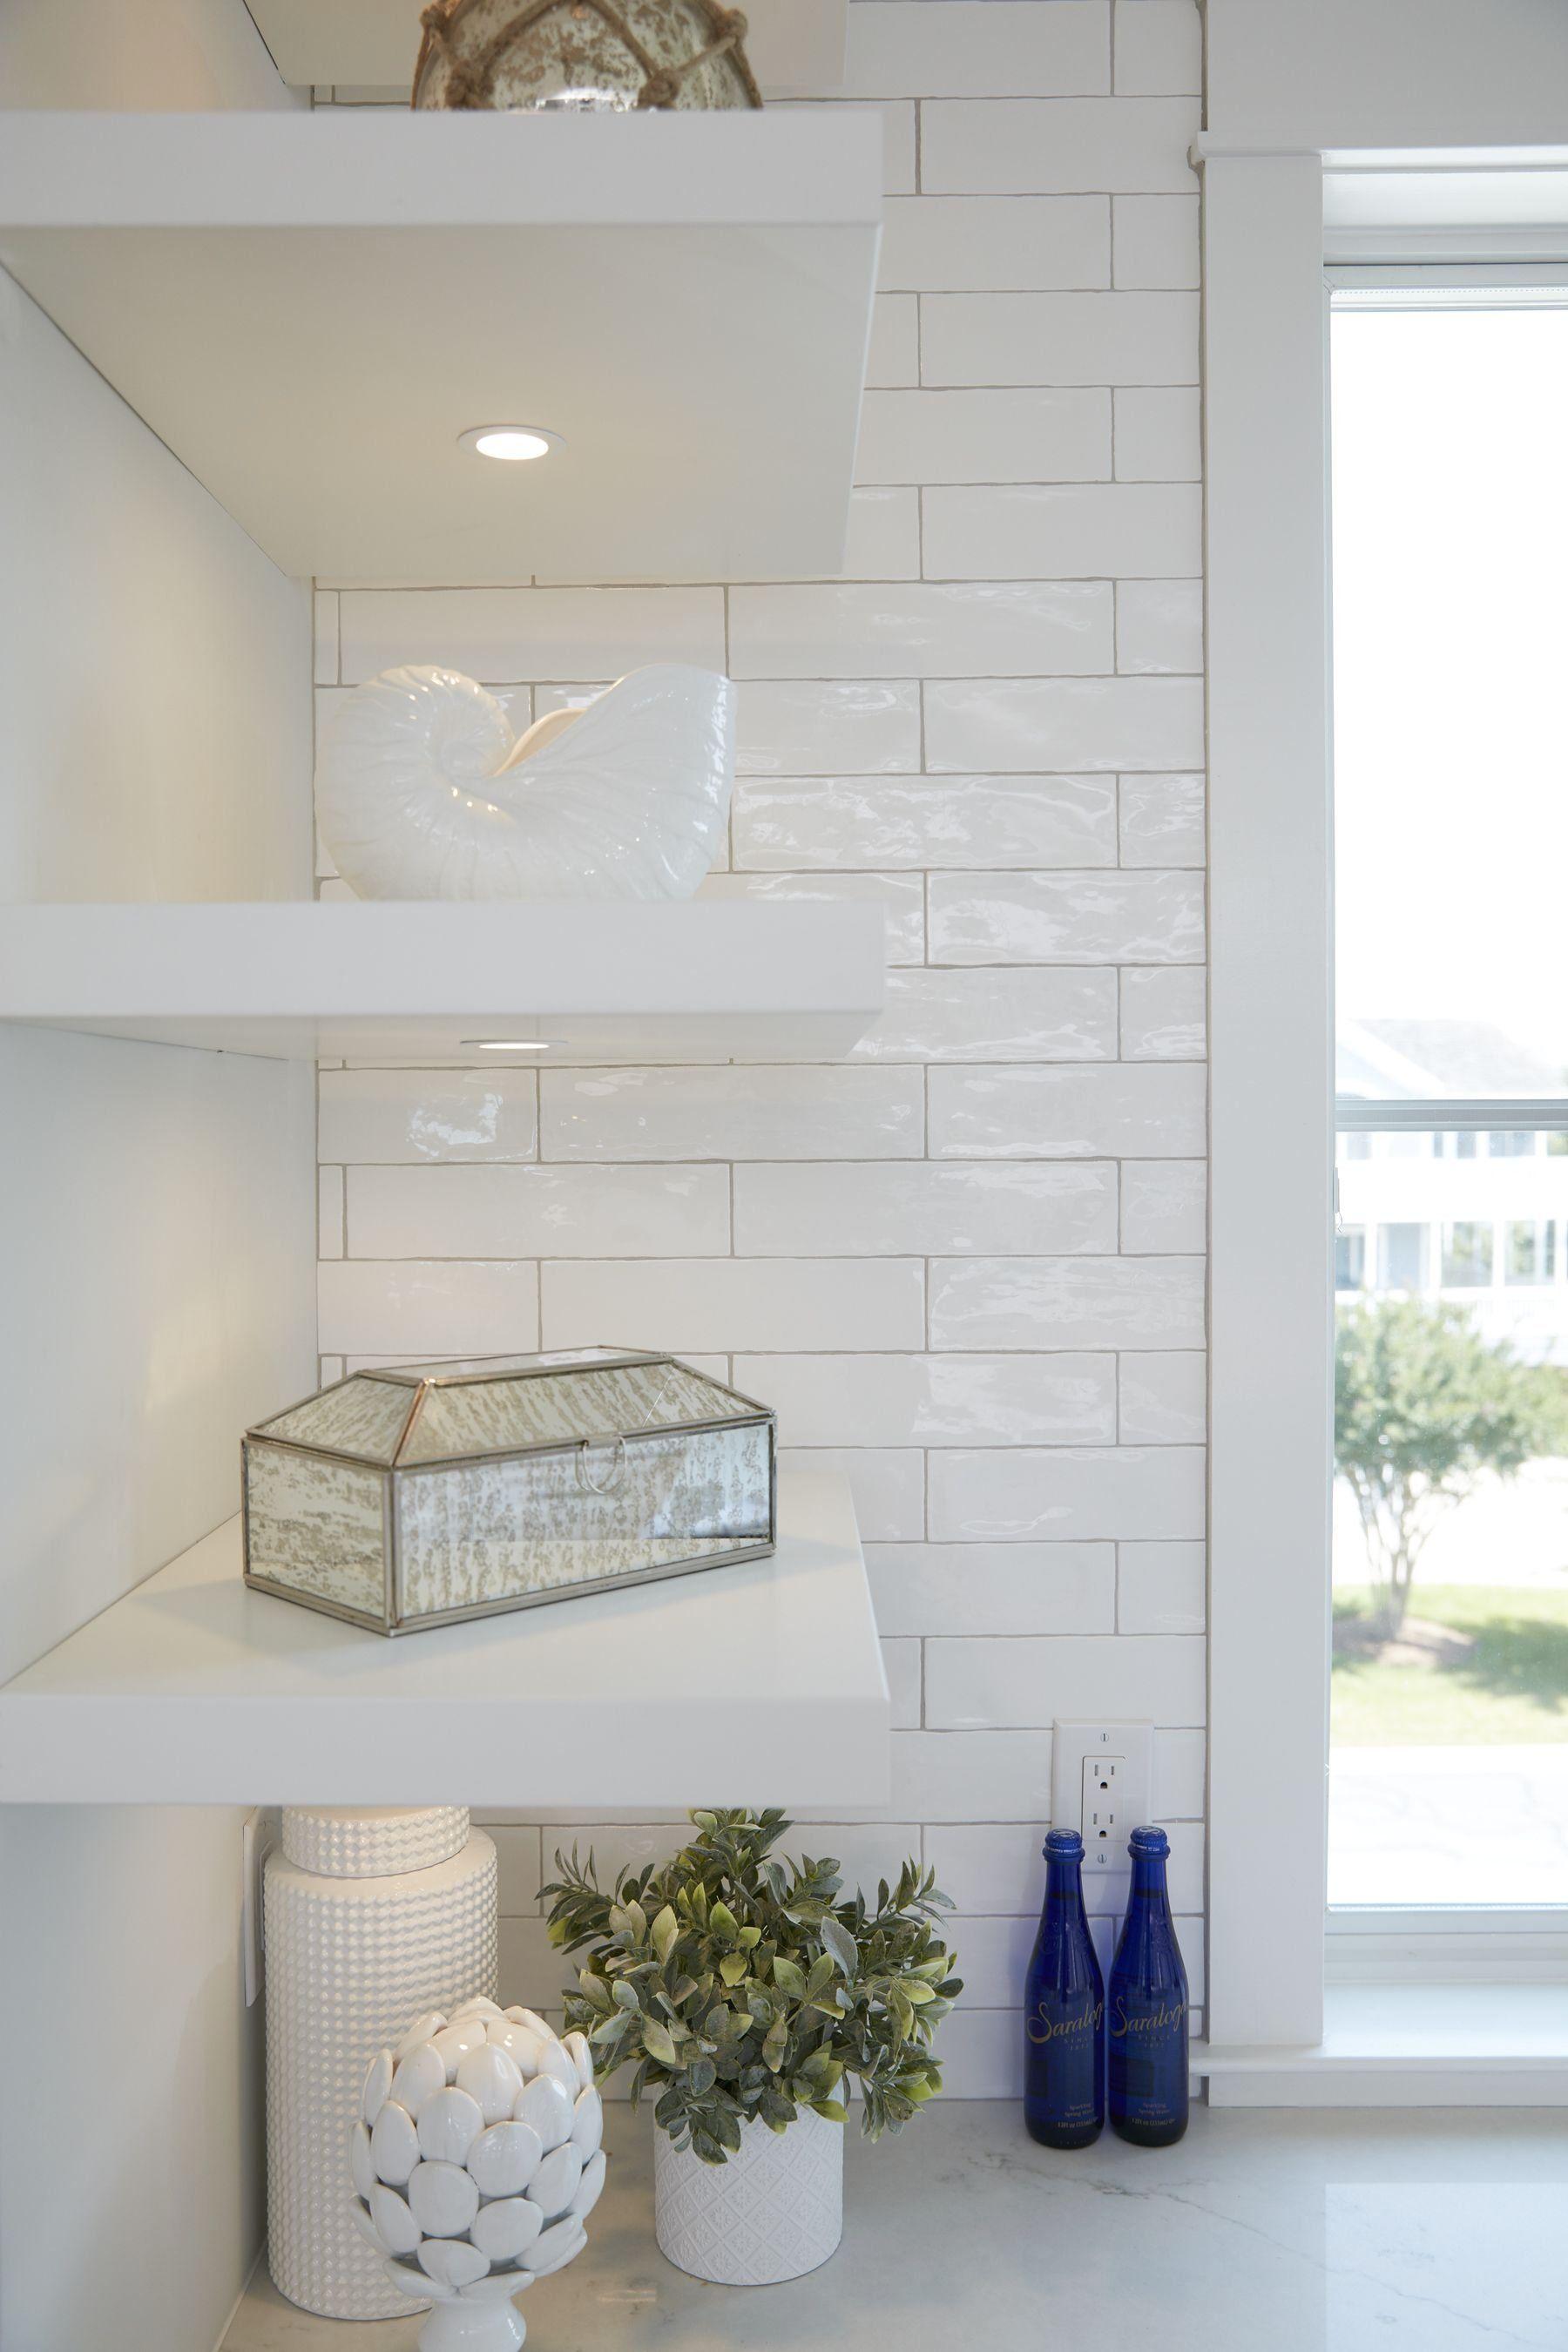 White Kitchen Backsplash 1000 White Kitchen Backsplash White Subway Tile Kitchen White Subway Tiles Kitchen Backsplash